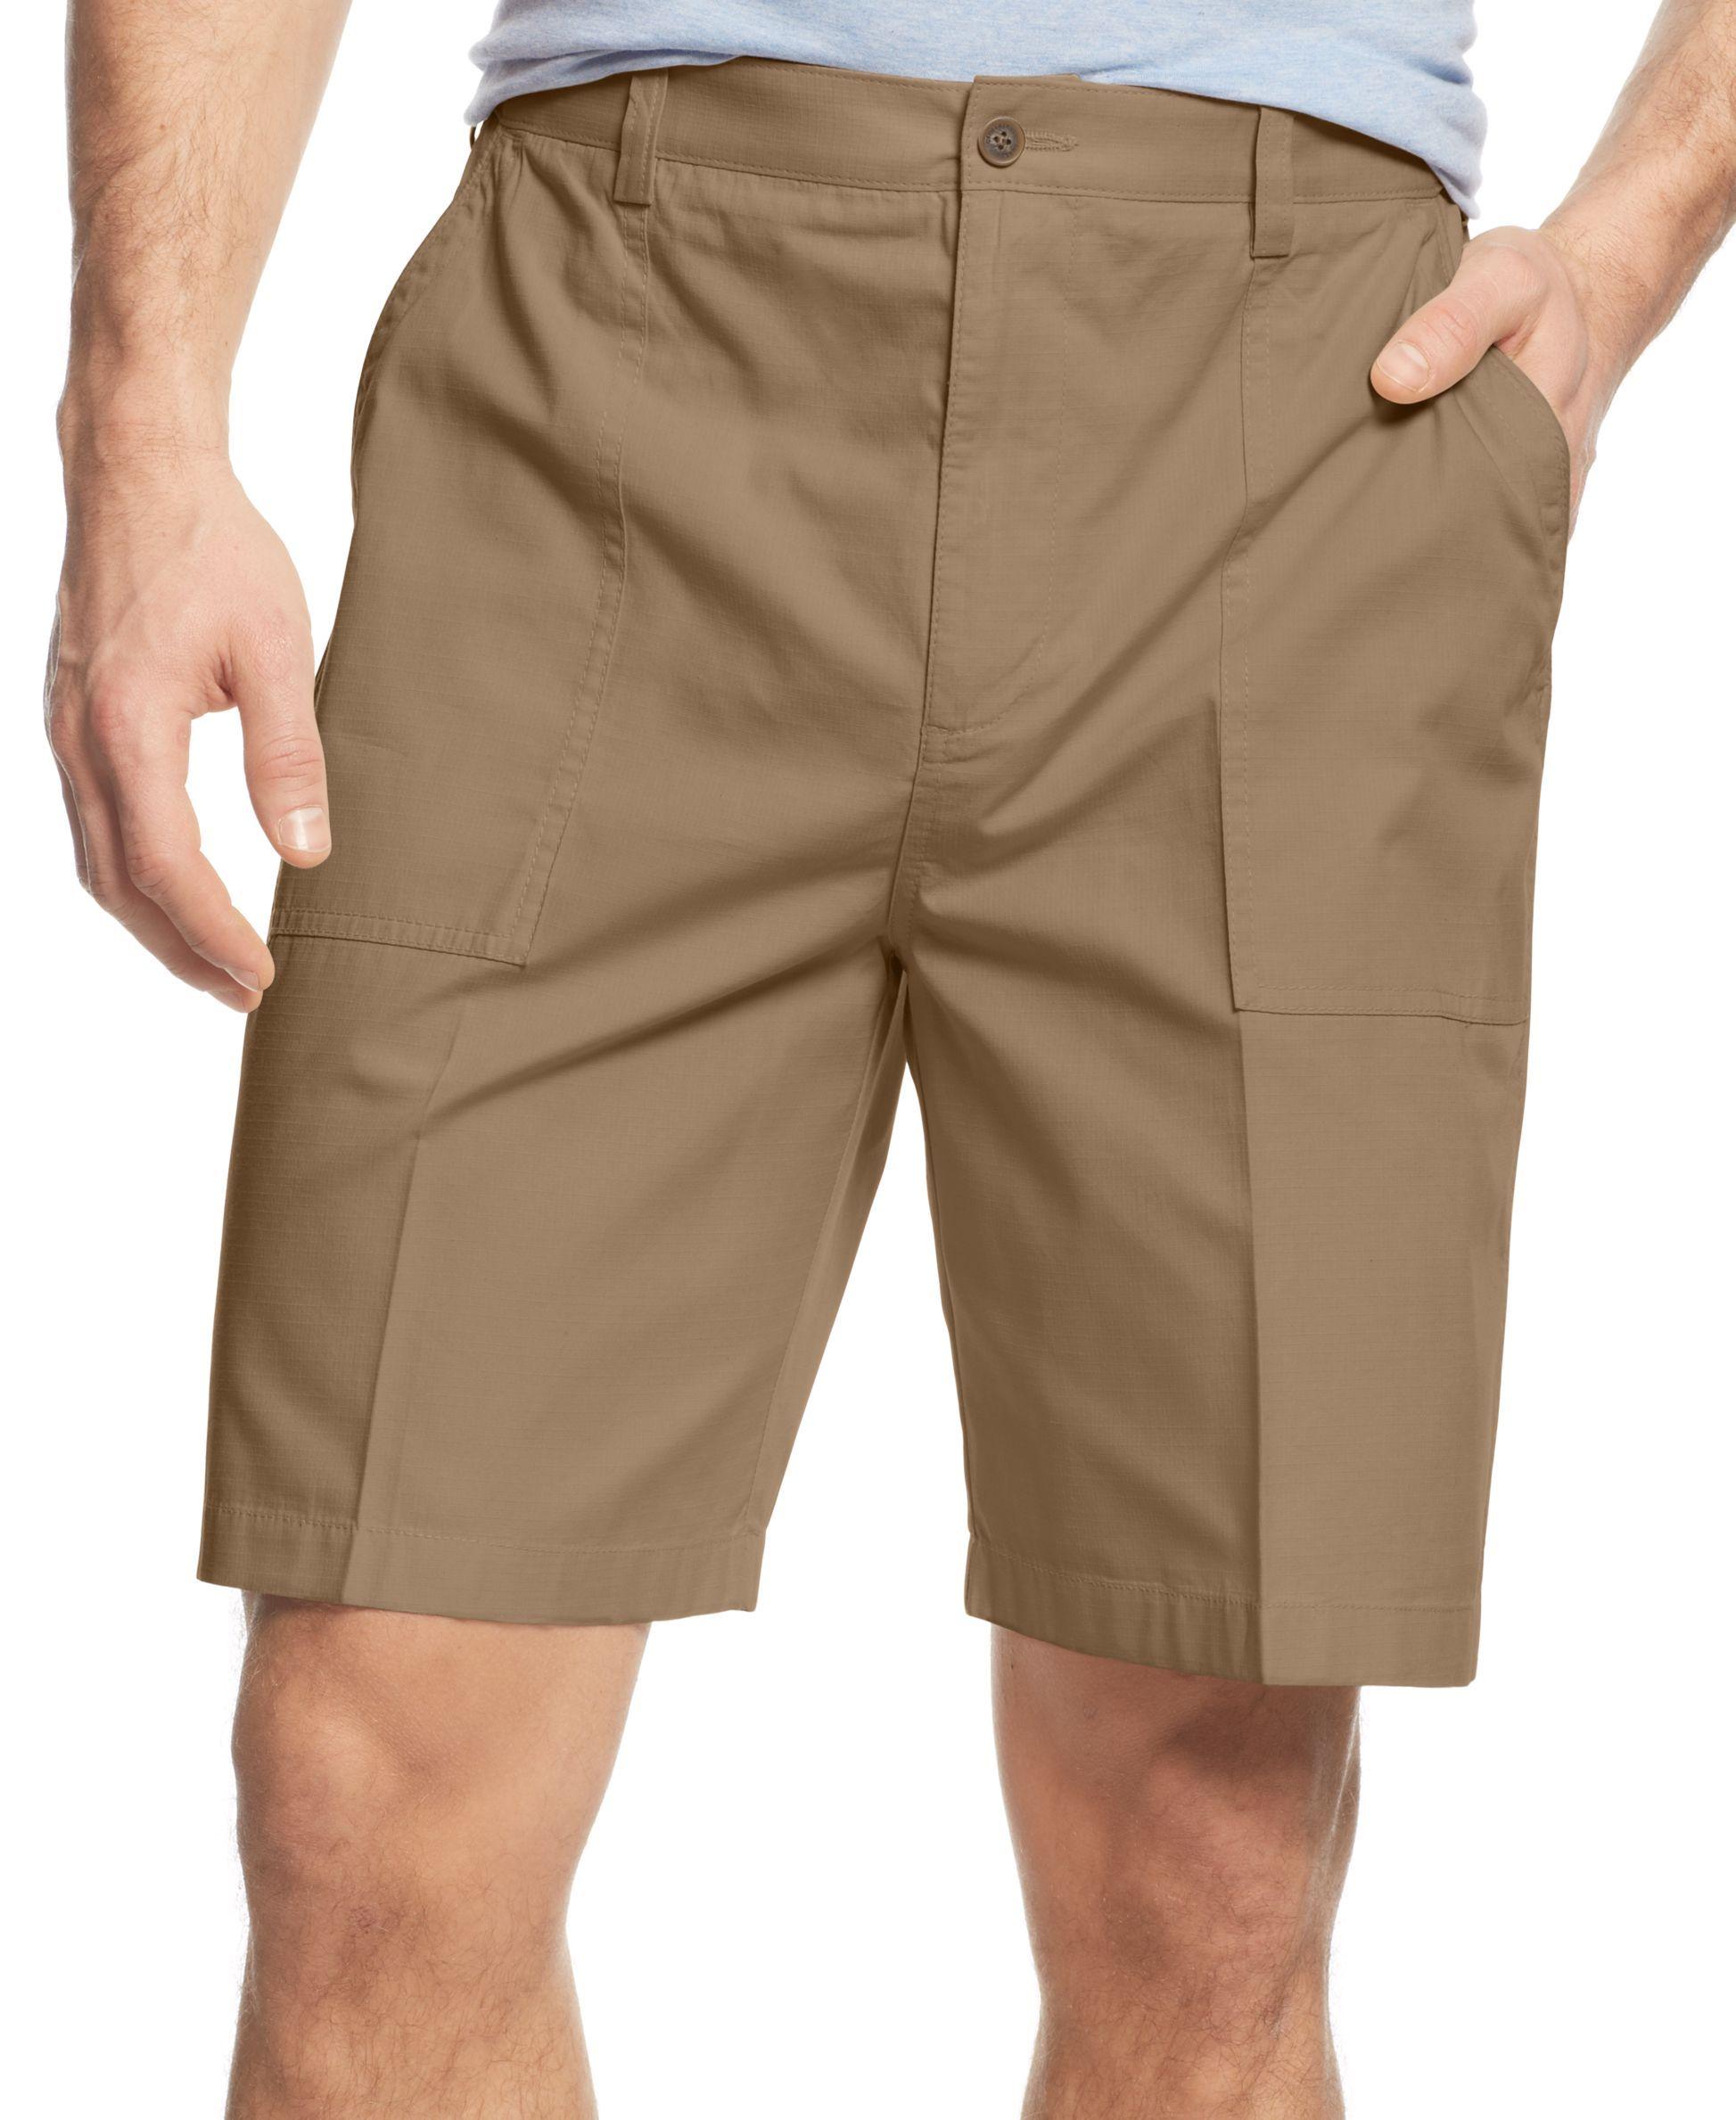 Geoffrey Beene Ripstop Shorts